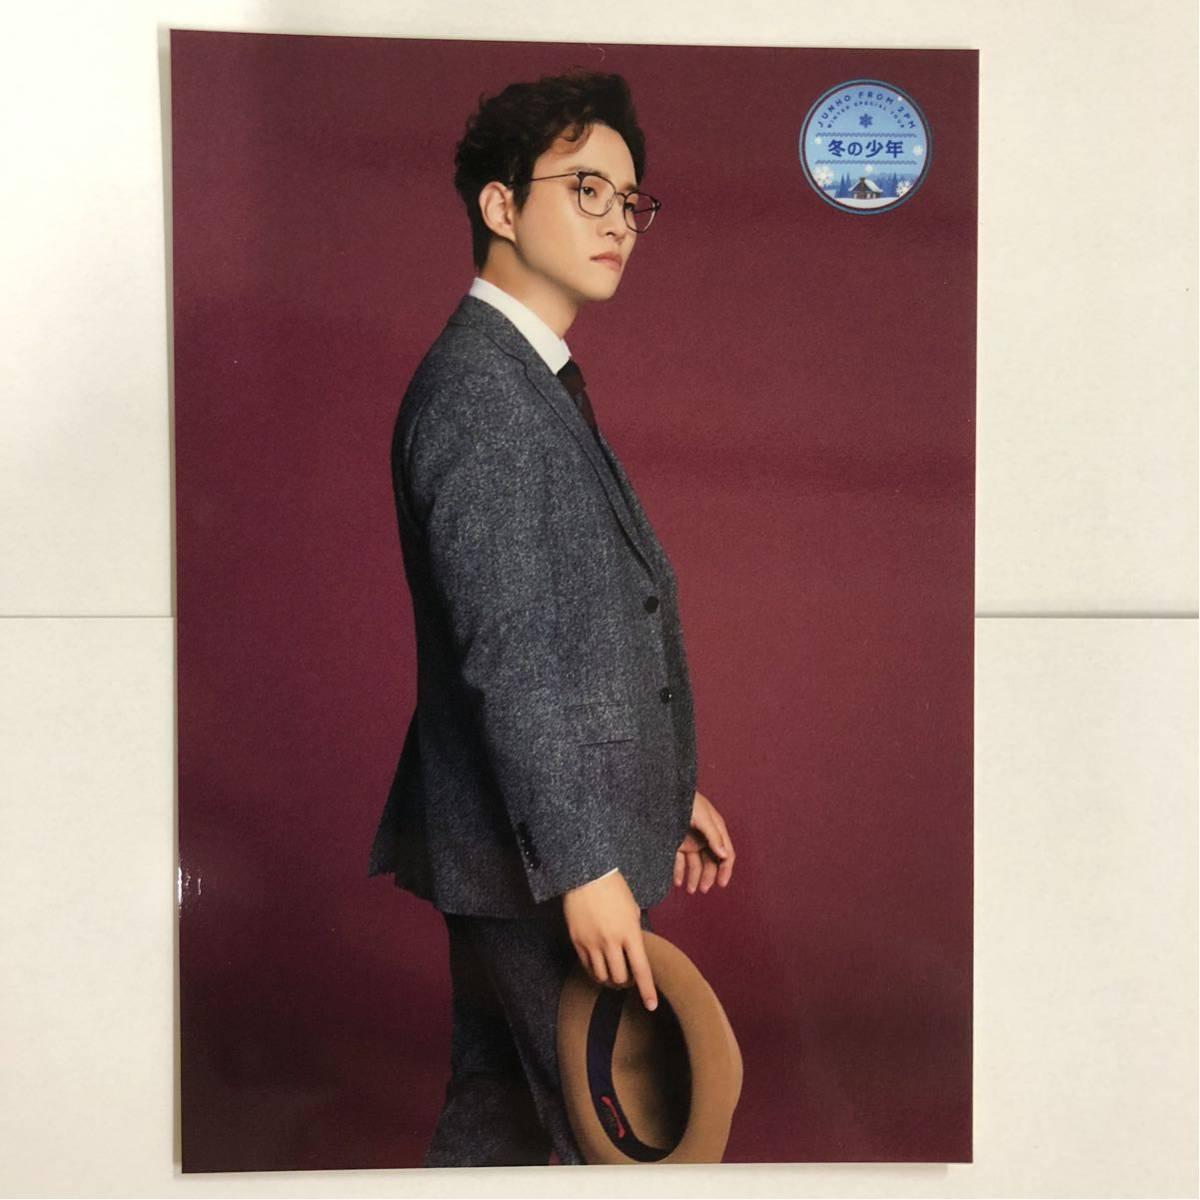 2PM JUNHO 冬の少年 トレカ ジュノ ⑪